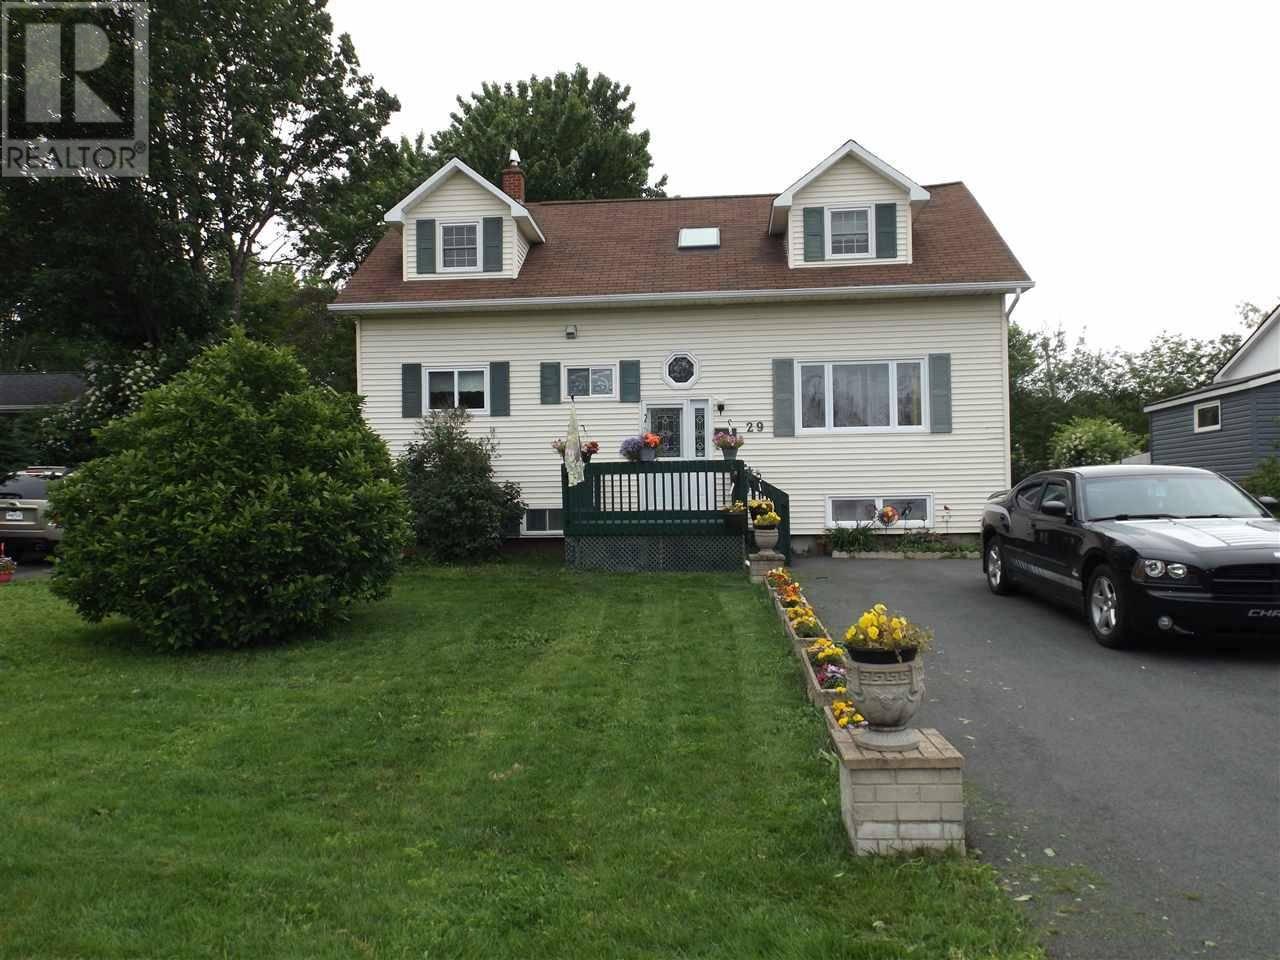 House for sale at 29 Parmac Dr Lower Sackville Nova Scotia - MLS: 201904619